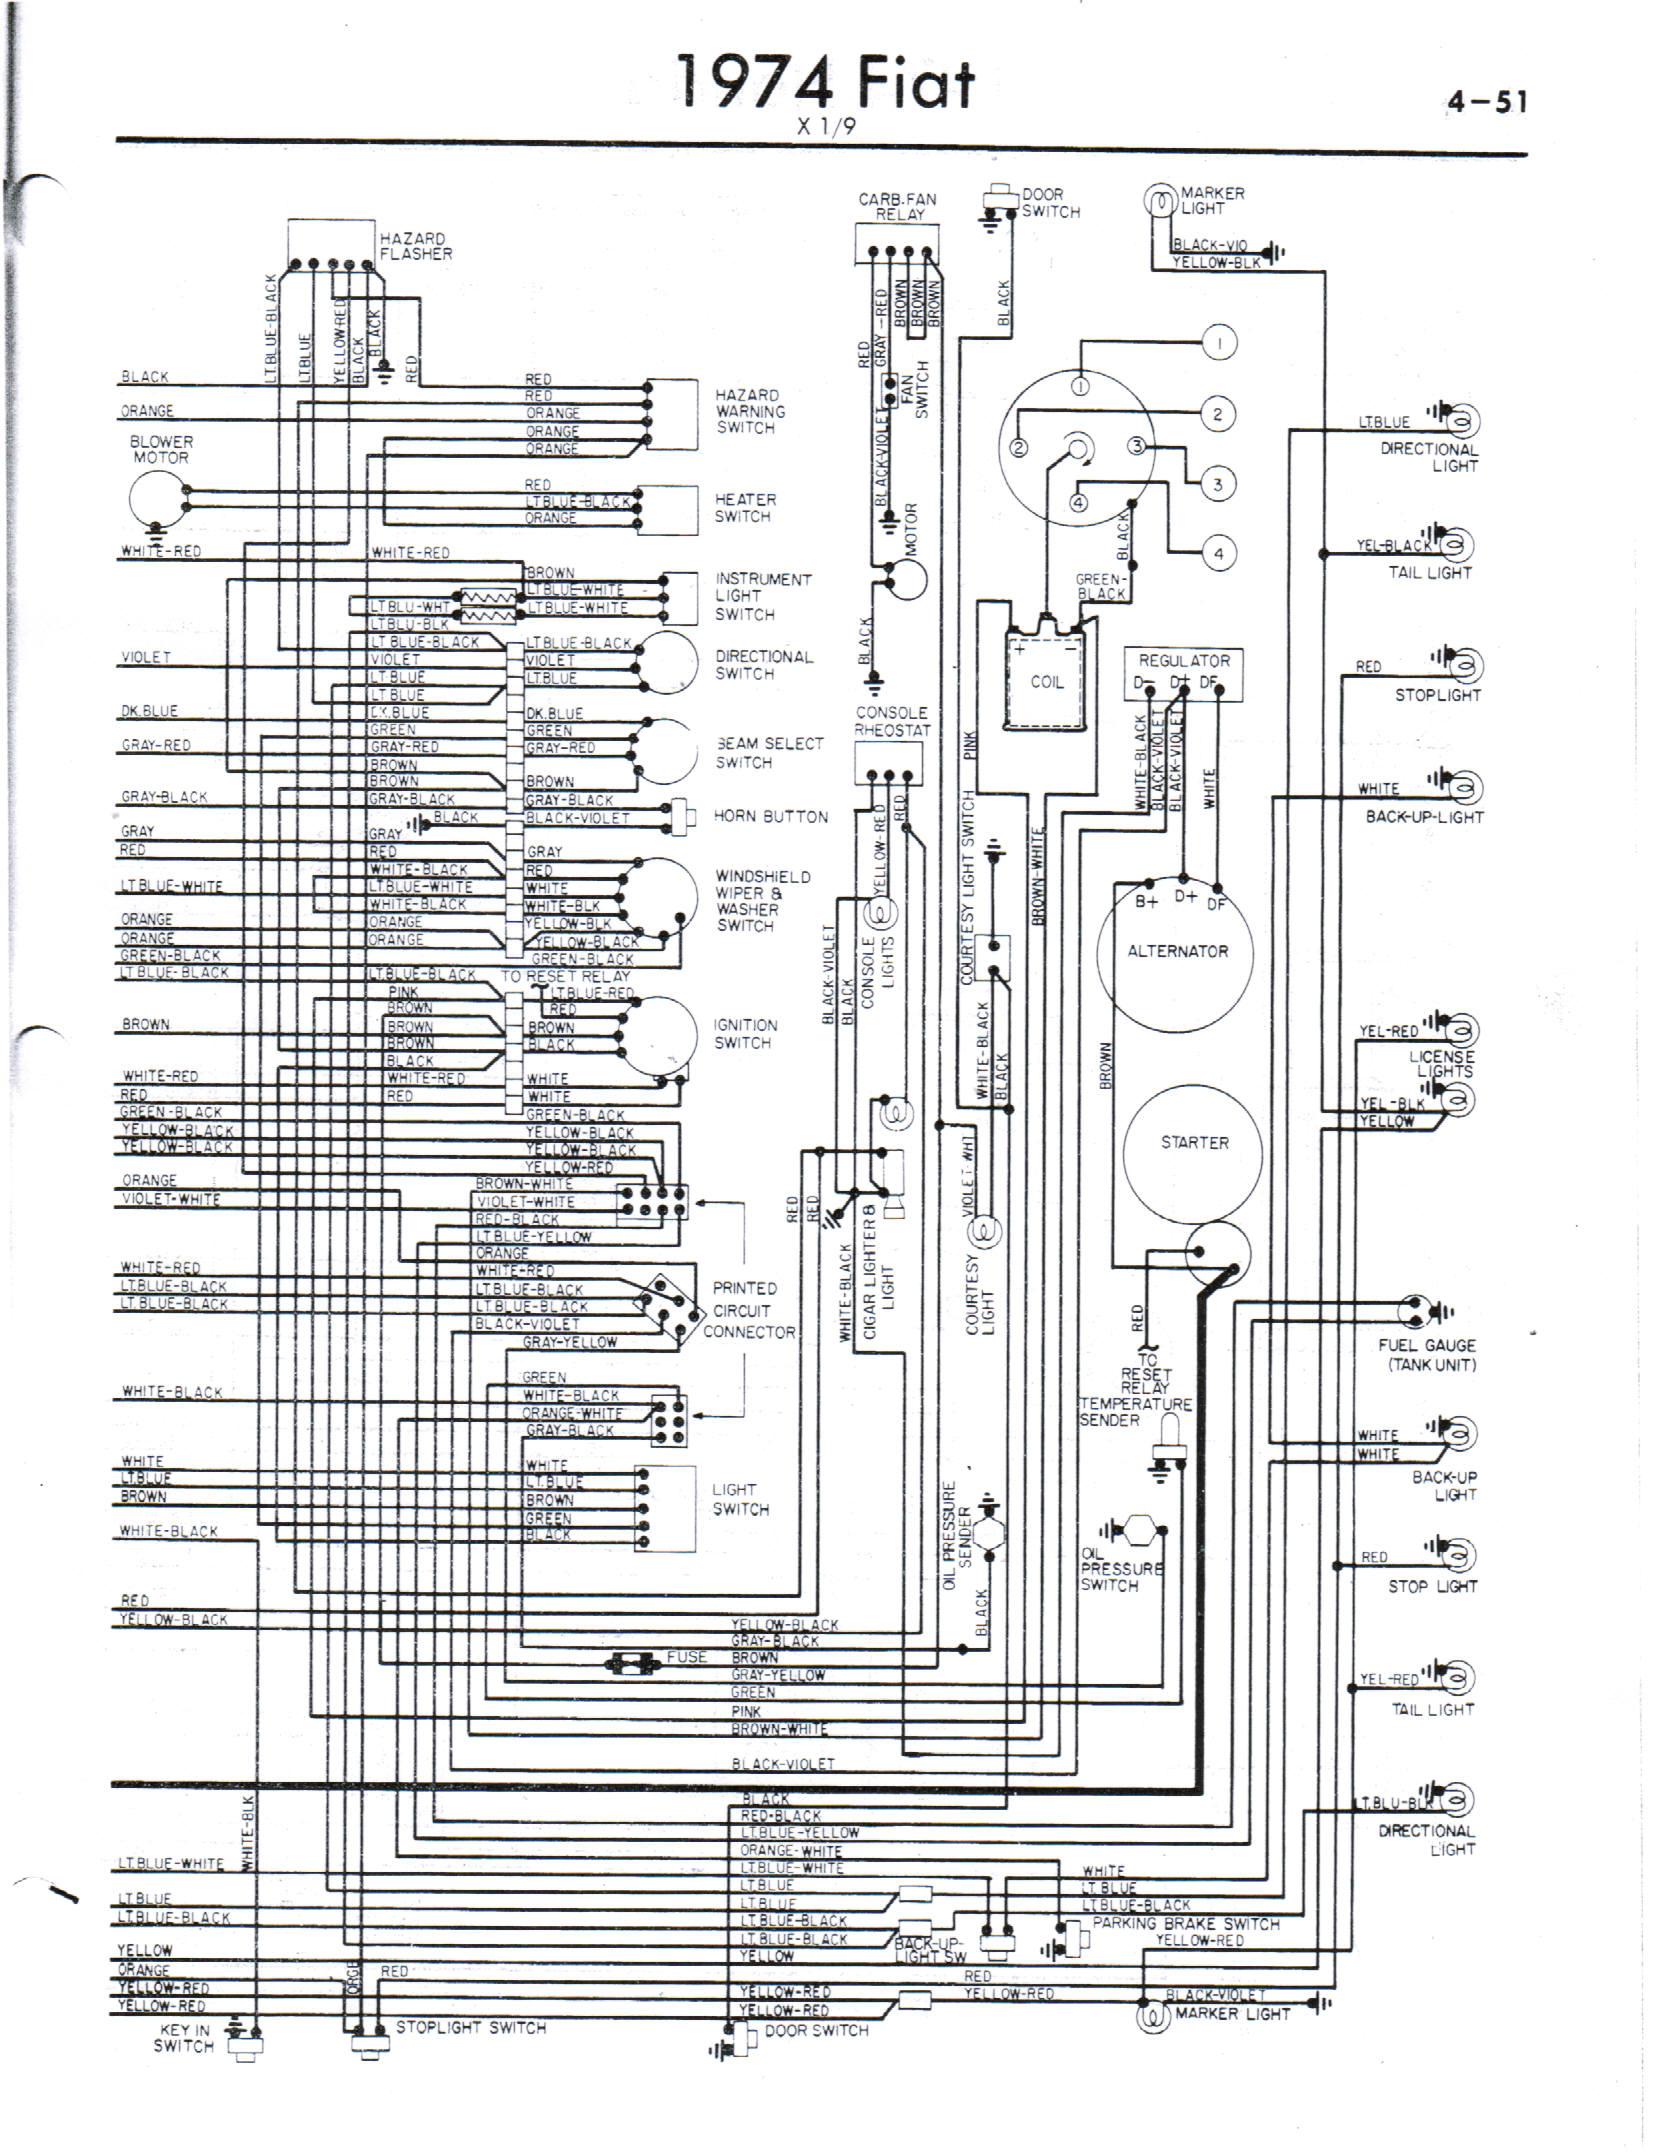 index of wcm personal 74 x19 electrical diagrams etc  74 x19 rear diagram jpg